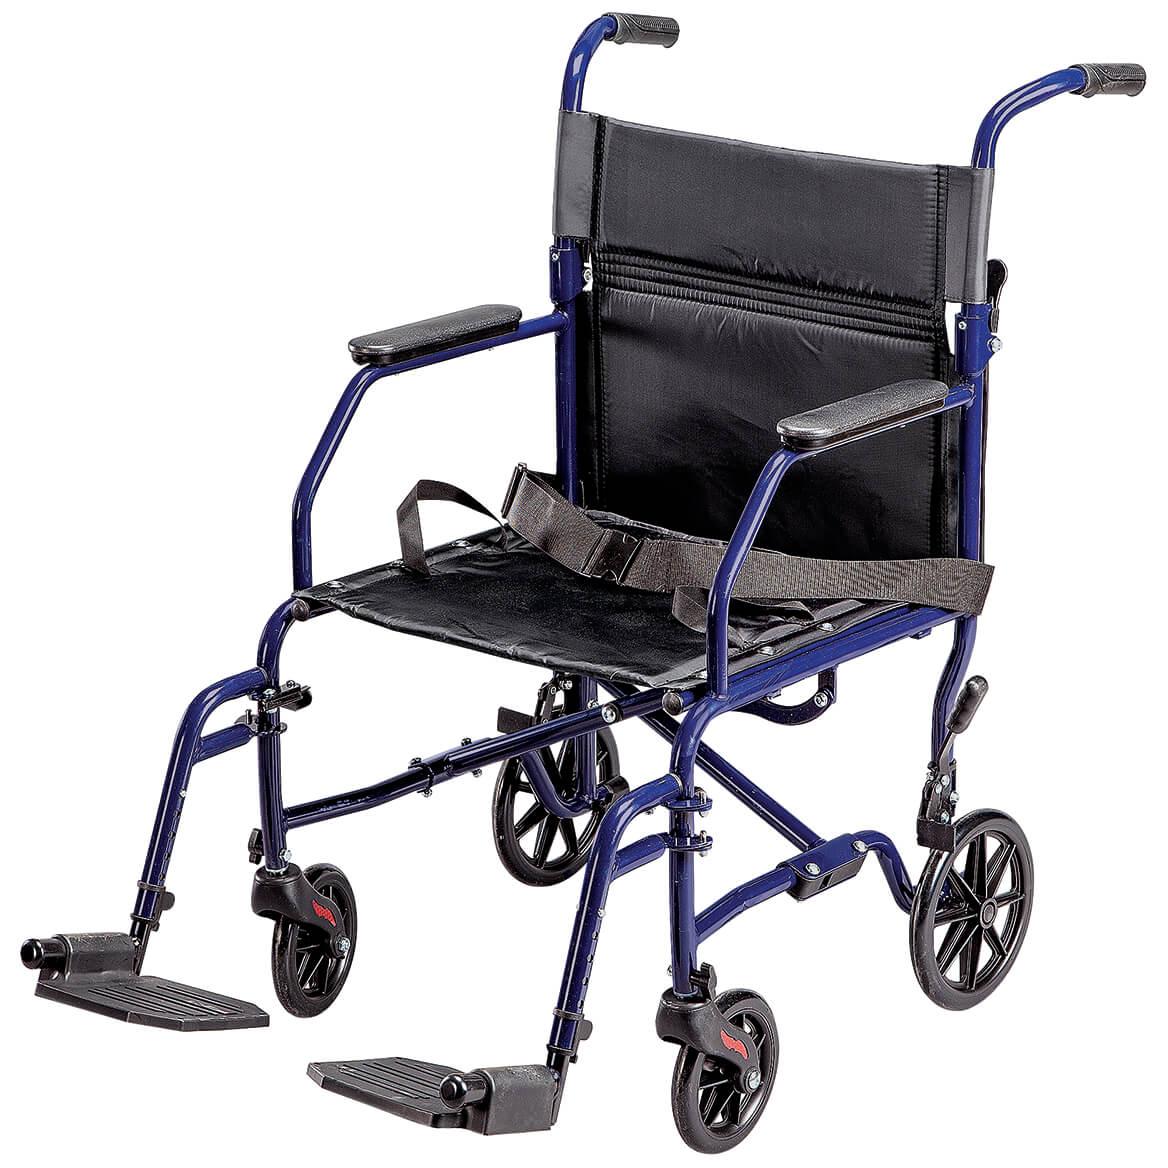 wheelchair drake wicker outdoor chairs melbourne lightweight transport chair